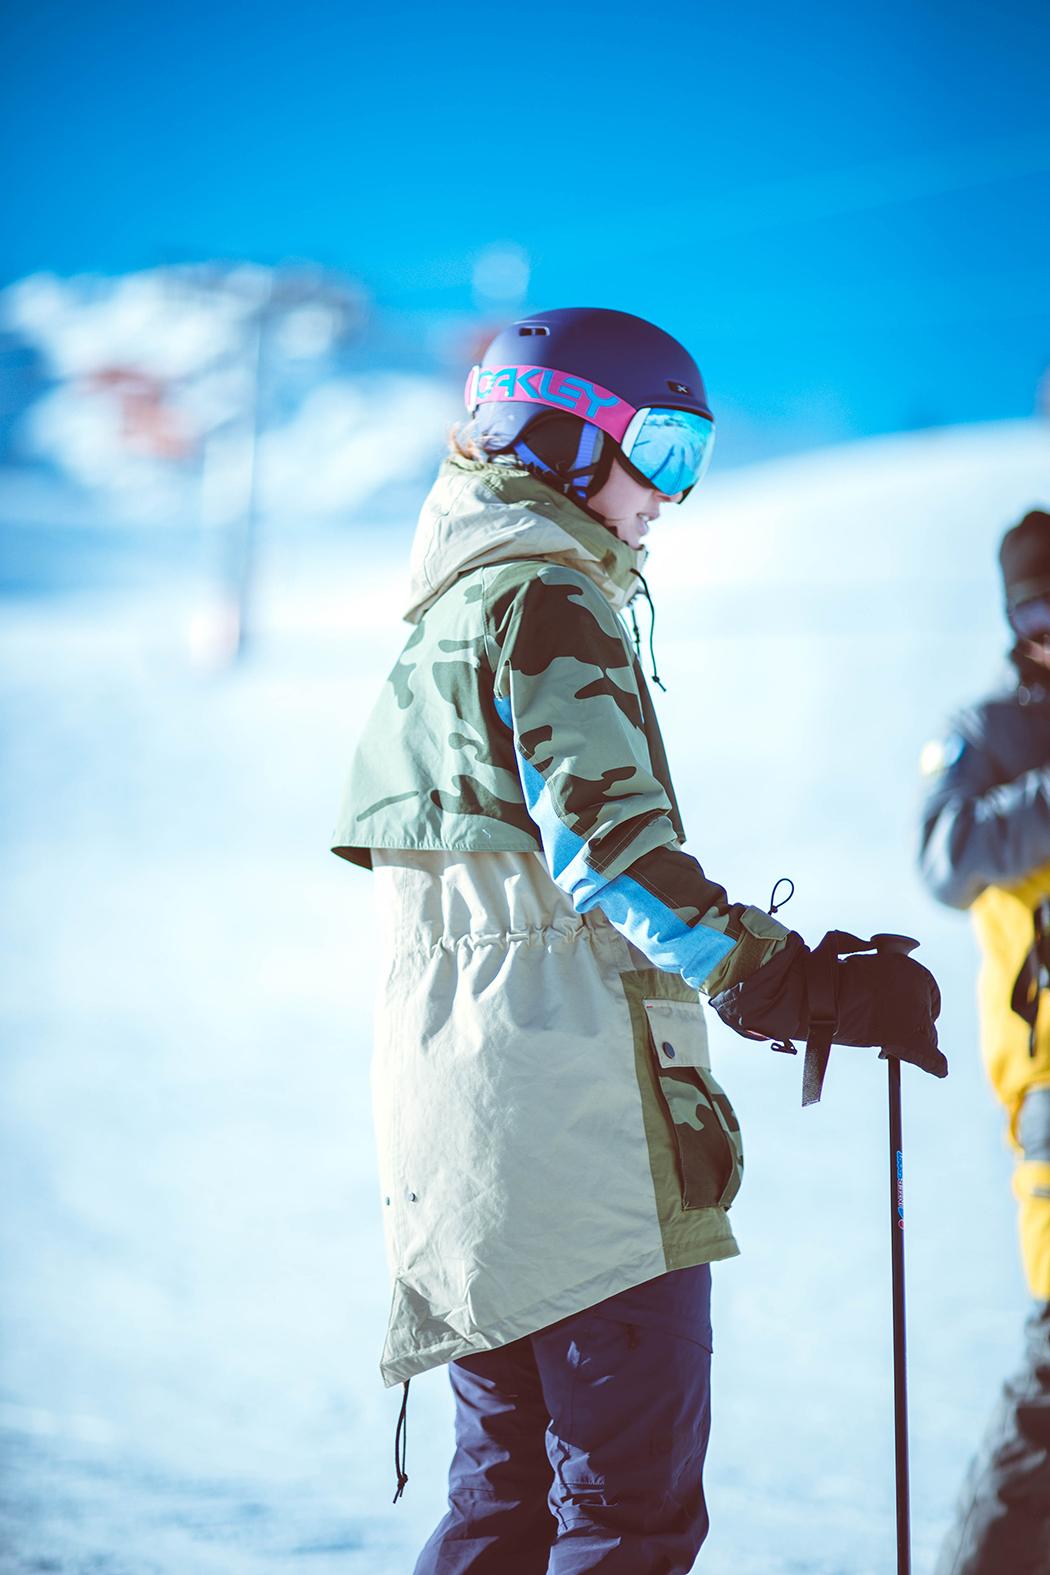 travelblog-travelblogger-travel-blog-blogger-soelden-skifahren-piste-lindarella-muenchen-deutschland-11-web